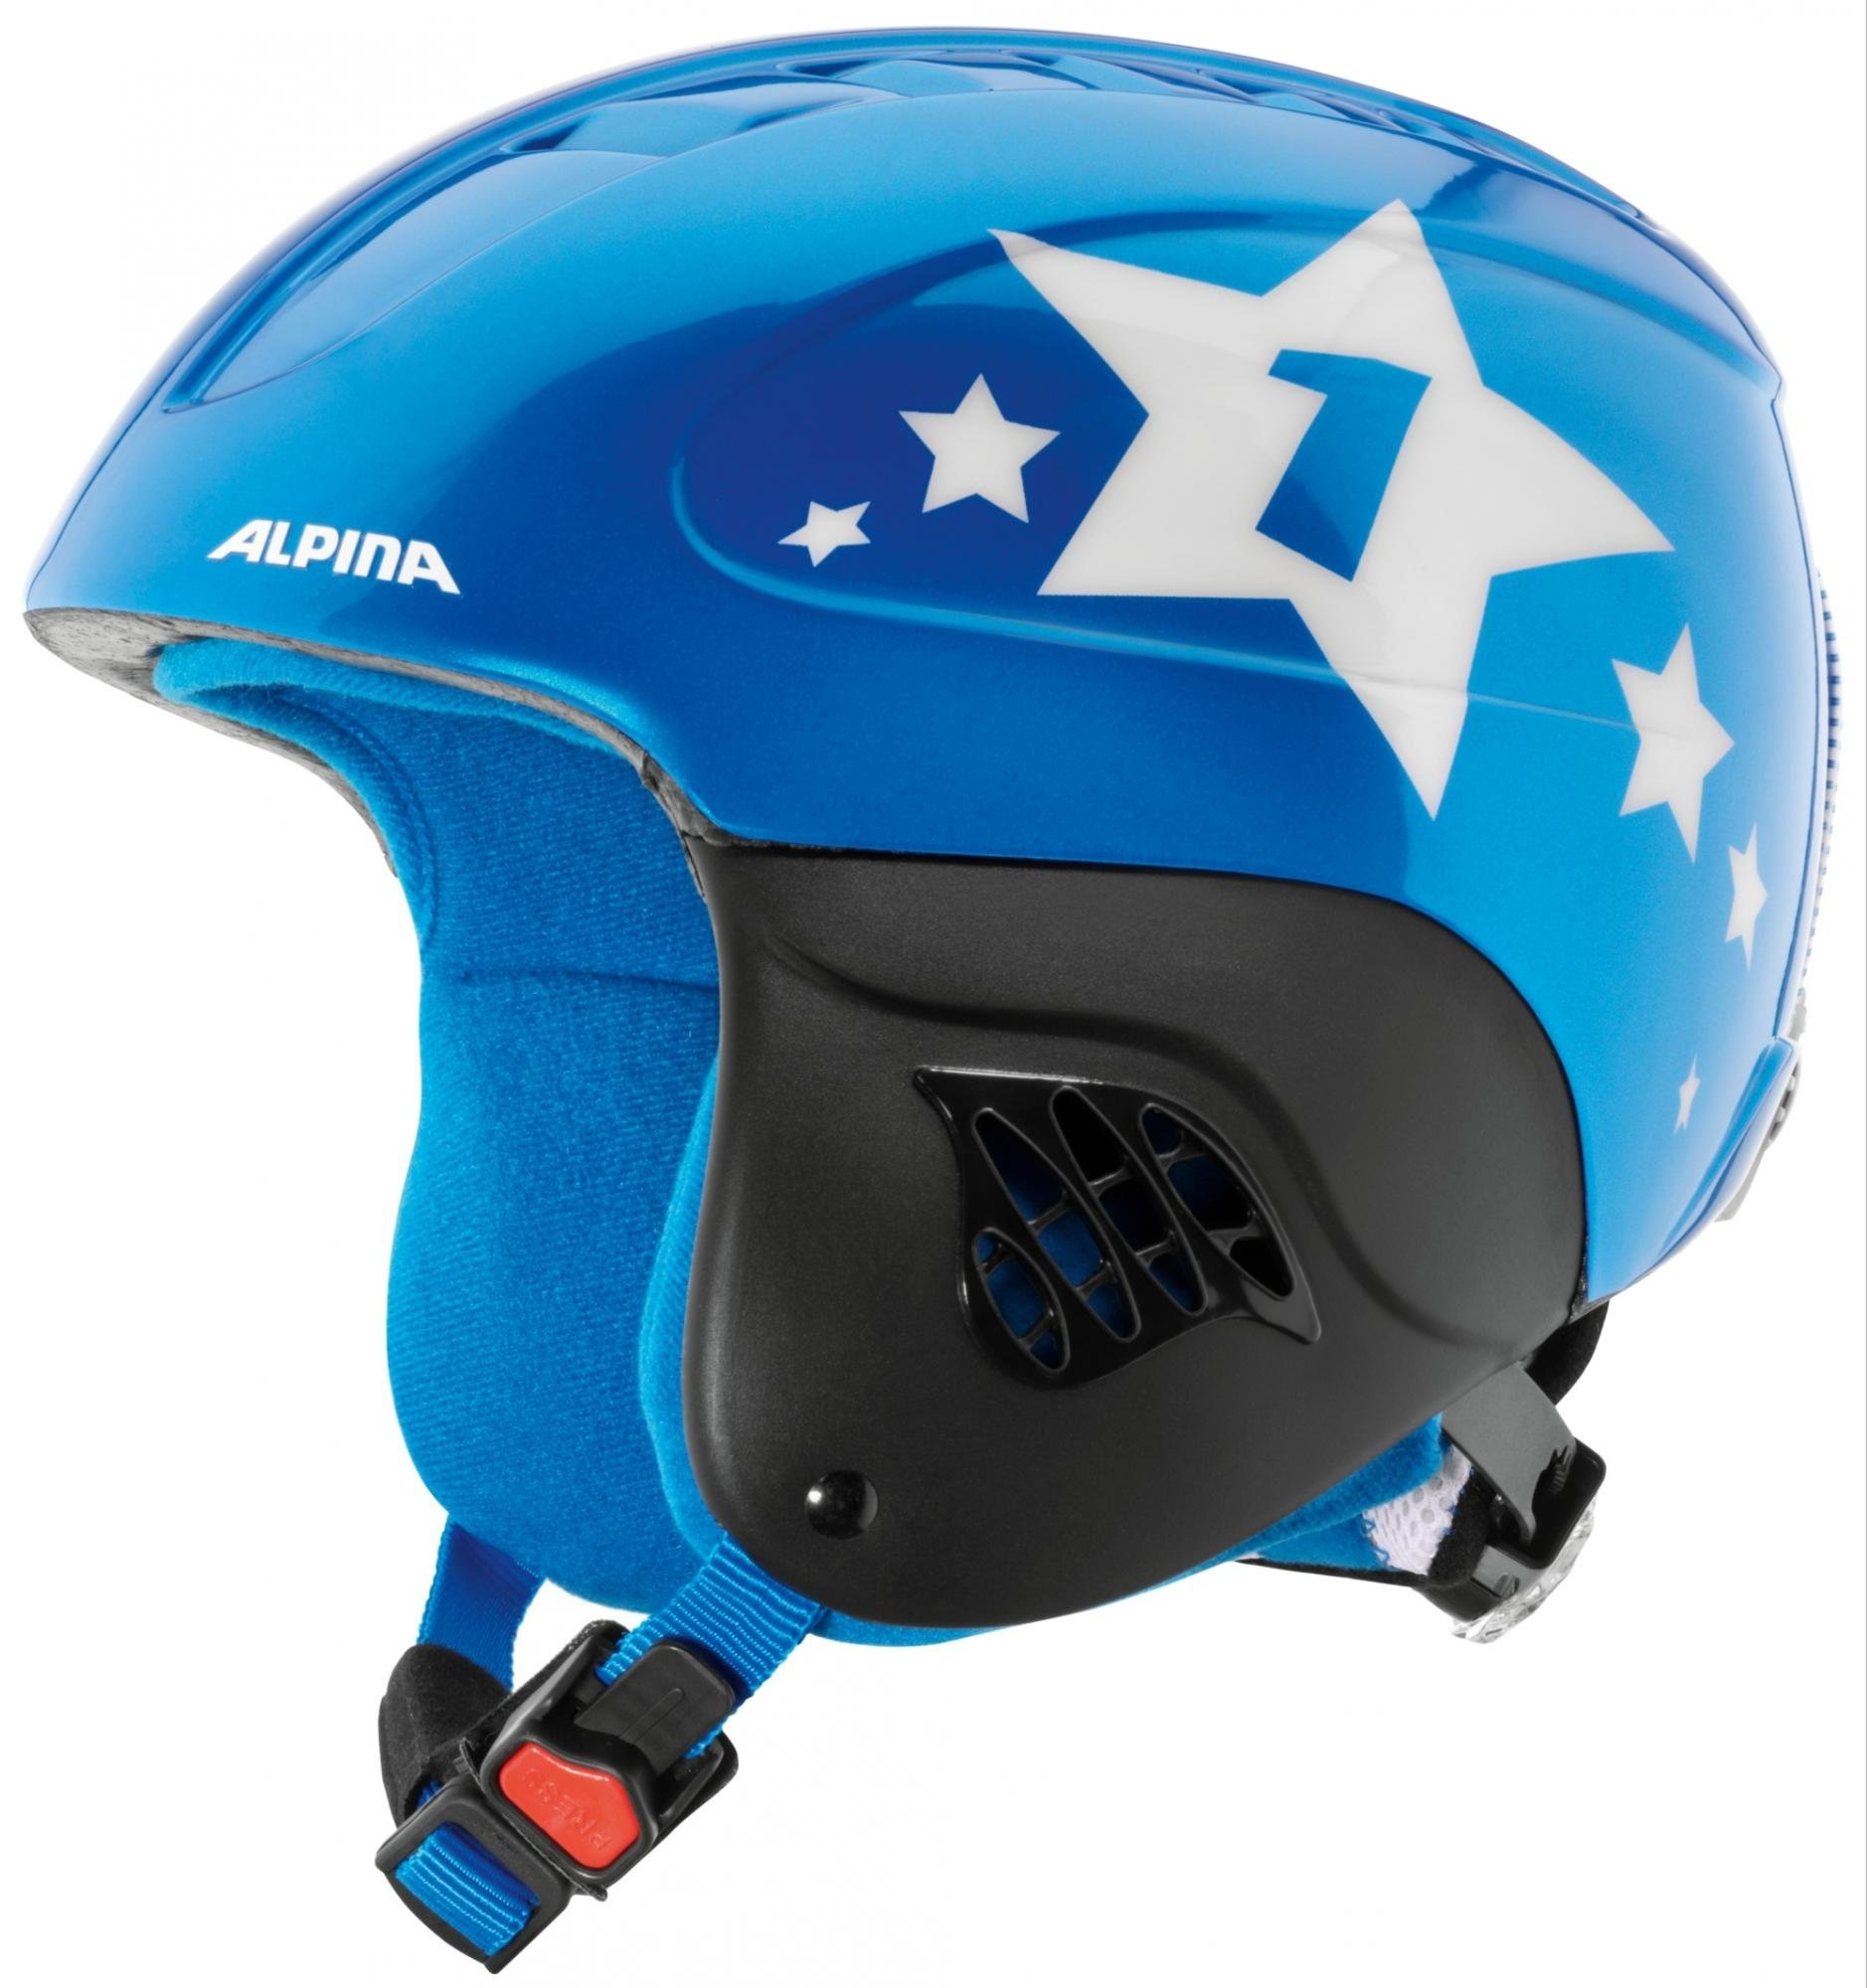 alpina Carat Blue-Star 48-52 - Glami.sk cfd8e9ad0a5